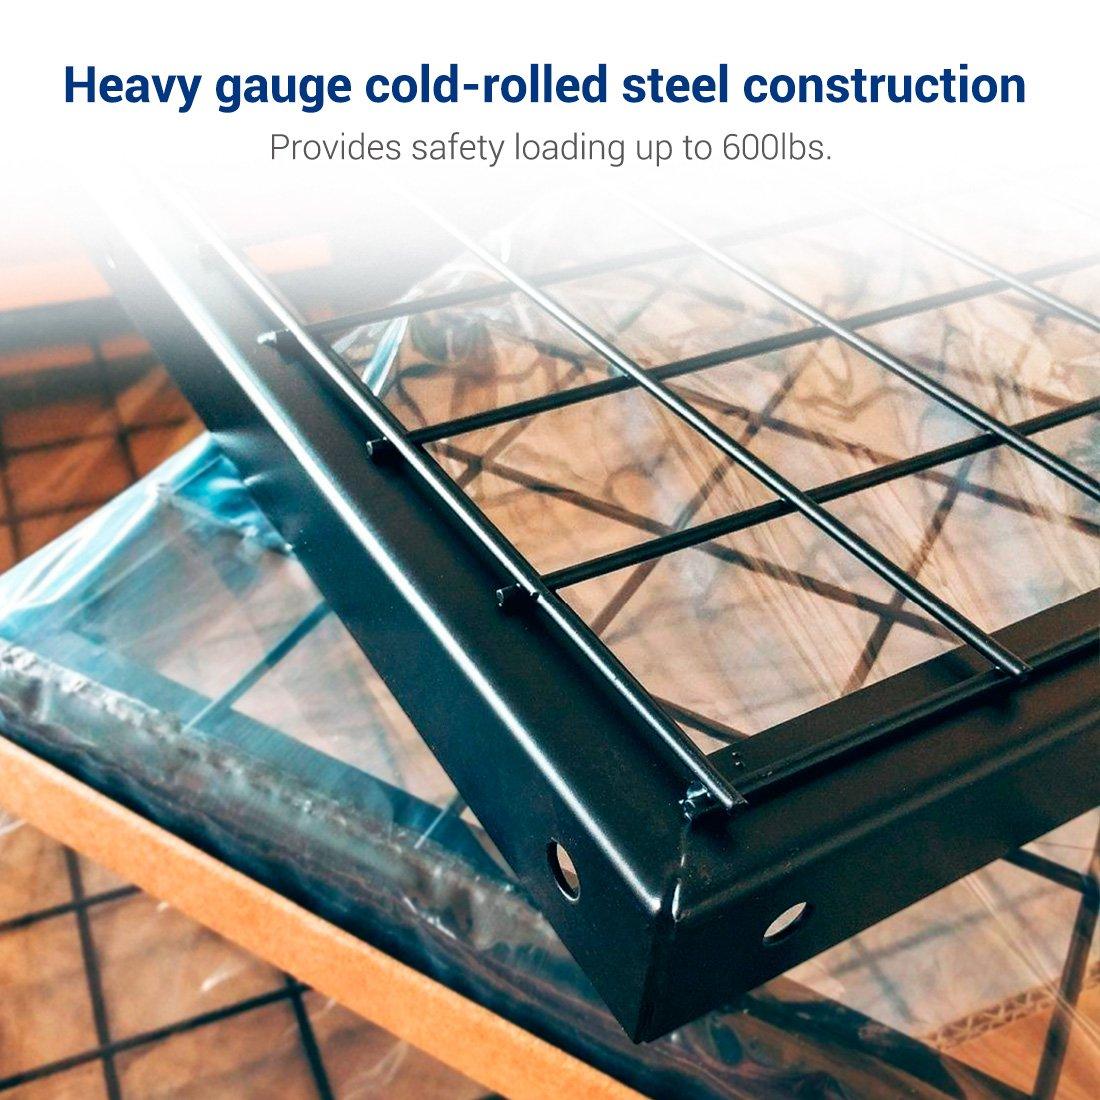 FLEXIMOUNTS 4x8 Overhead Garage Storage Rack Adjustable Ceiling Storage Rack Heavy Duty, 96